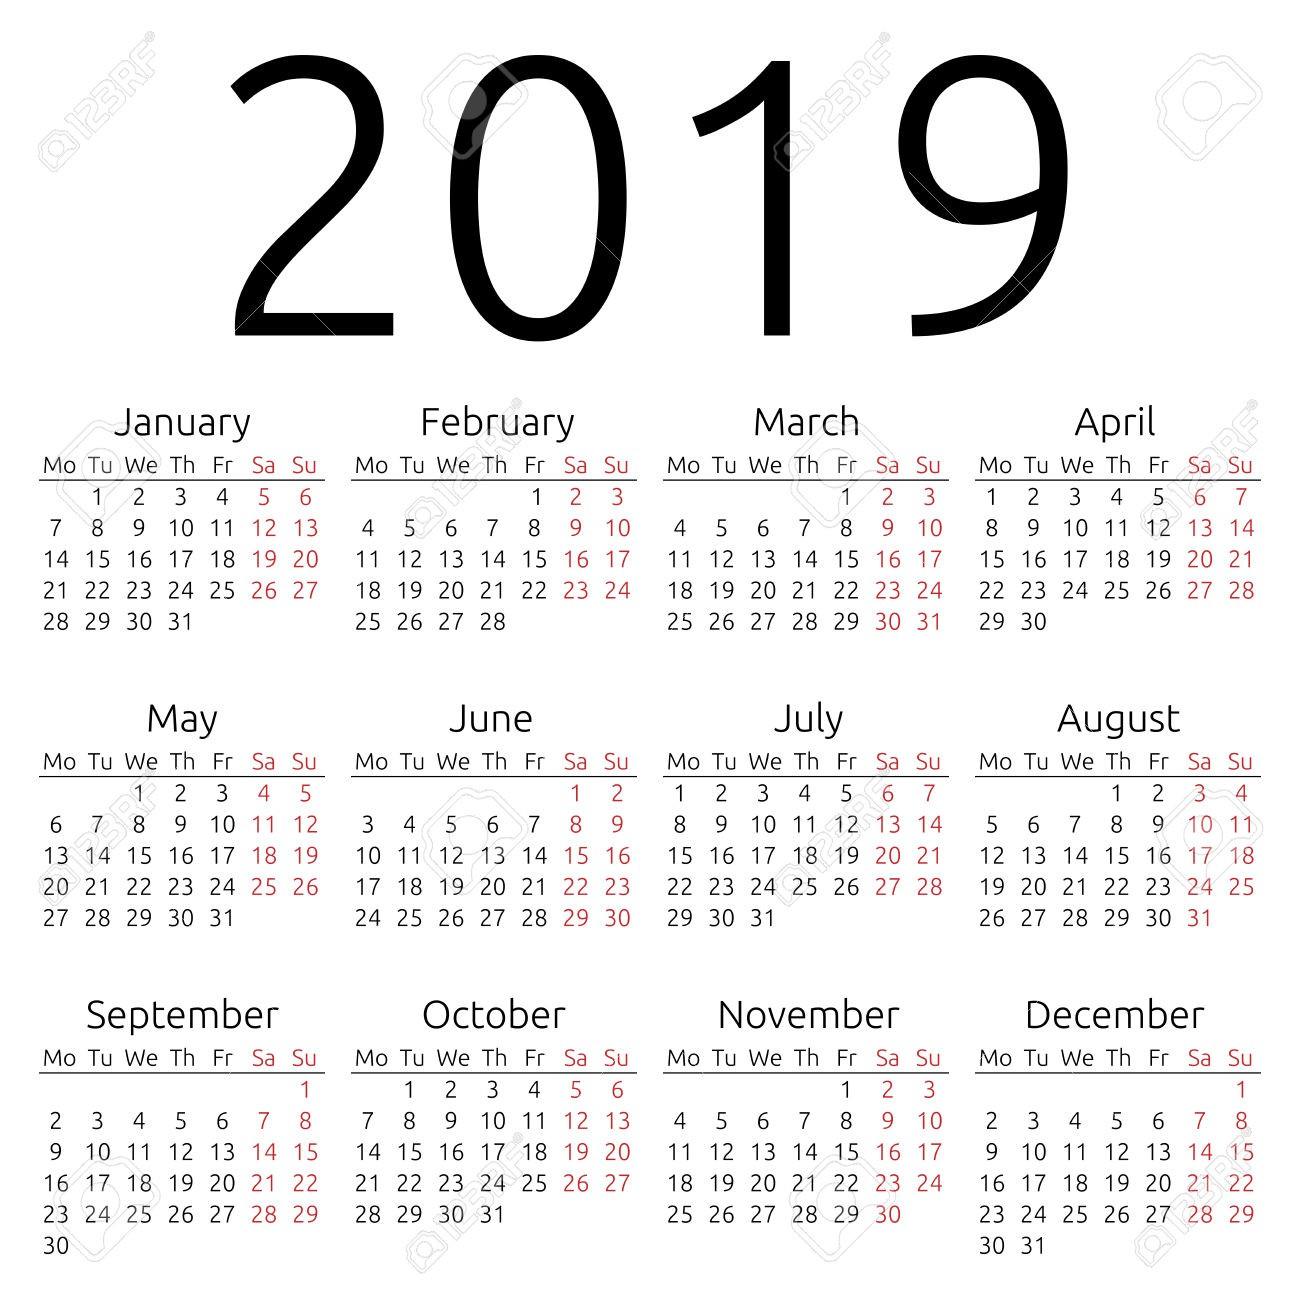 Yearly Printable Calendars